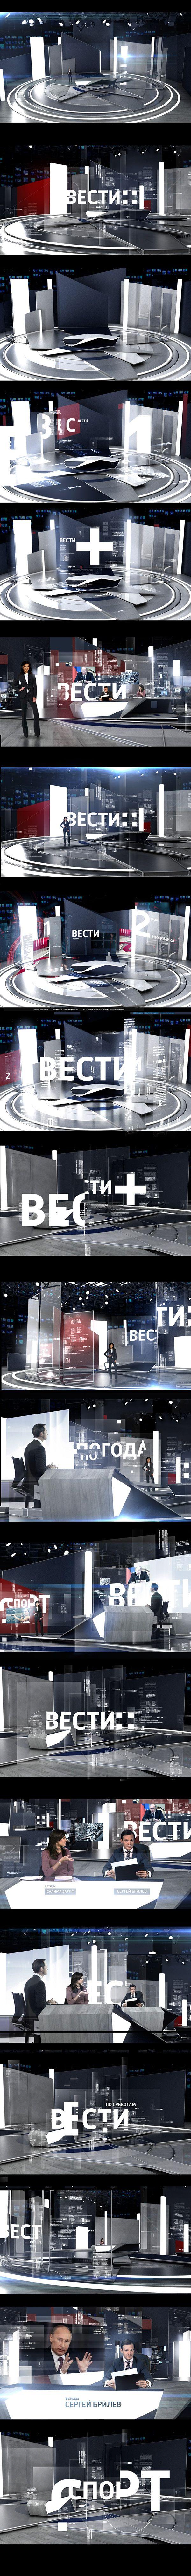 RUSSIA_1 CHANNEL NEWS STUDIO